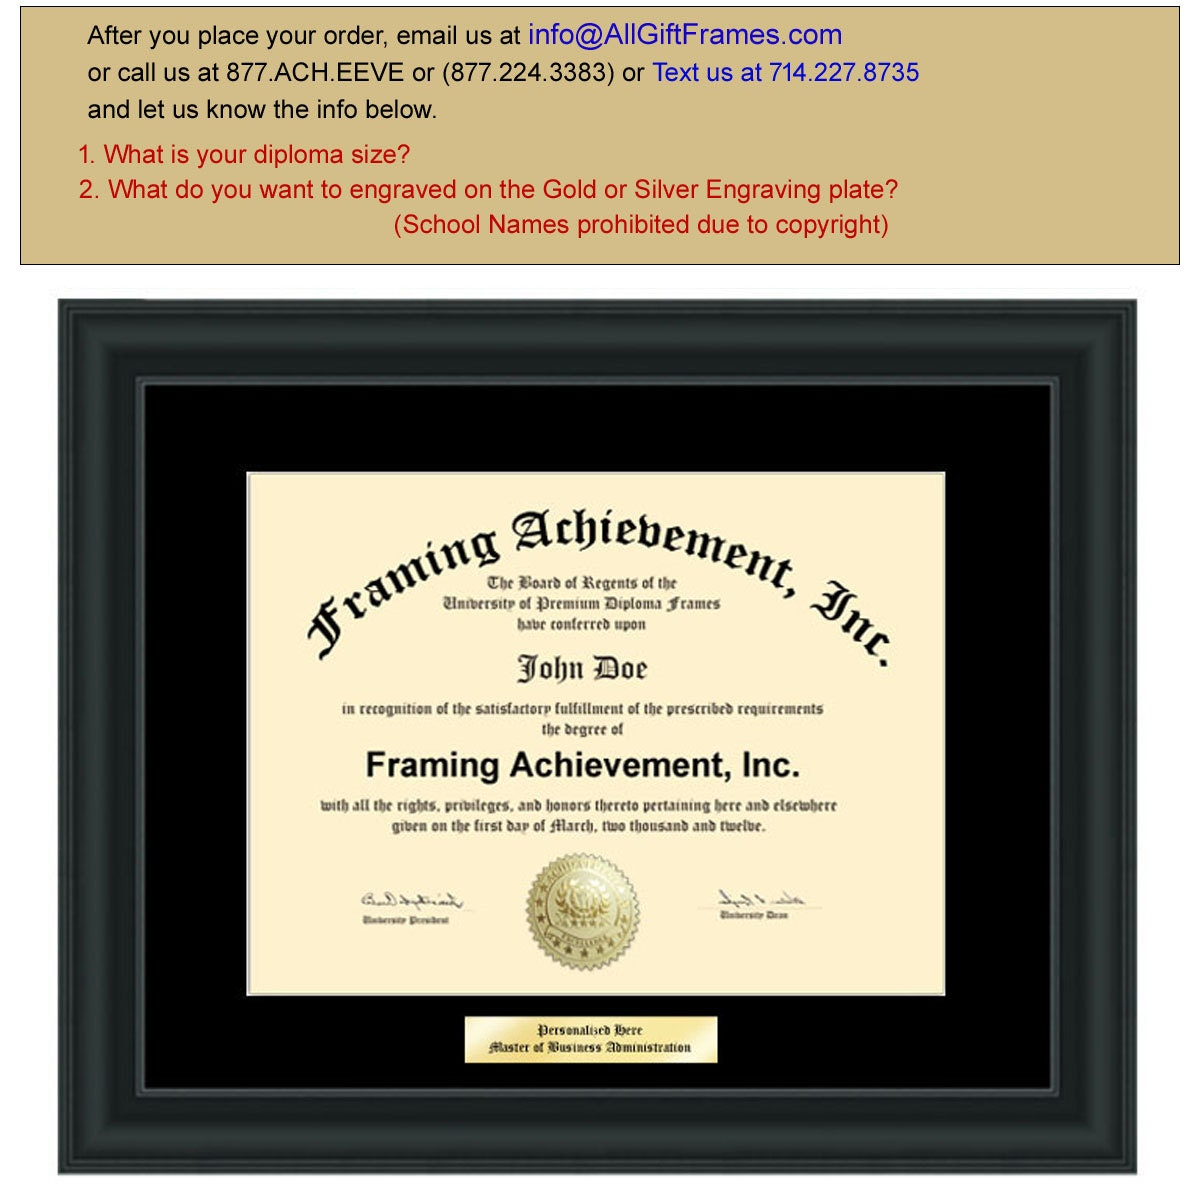 College Diploma Frame Engraving Plate Black Mat - Satin Black ...